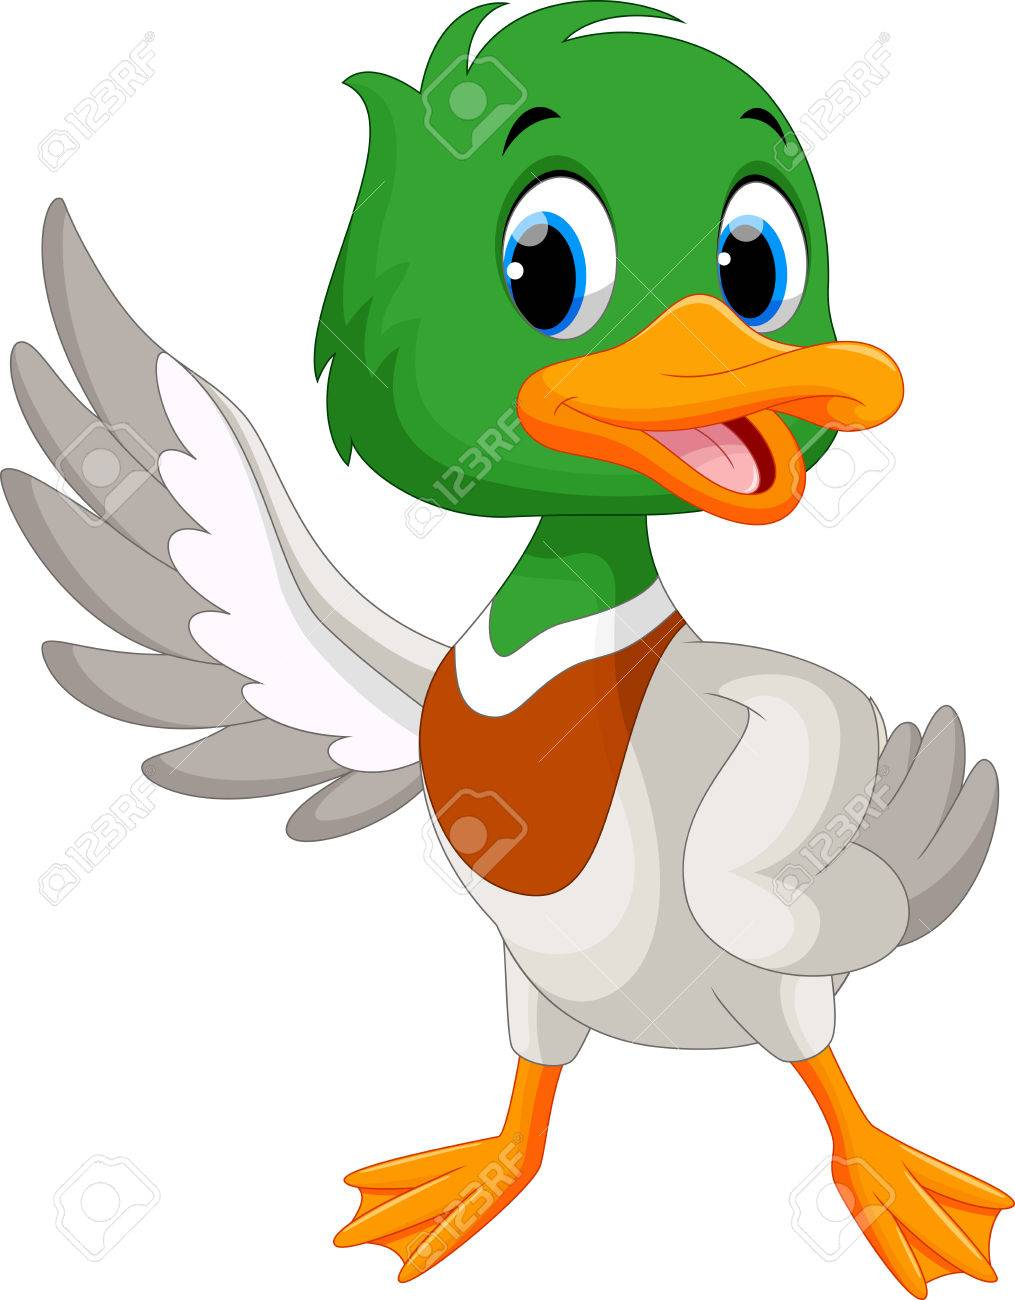 Cute baby duck waving its wings - 55049623